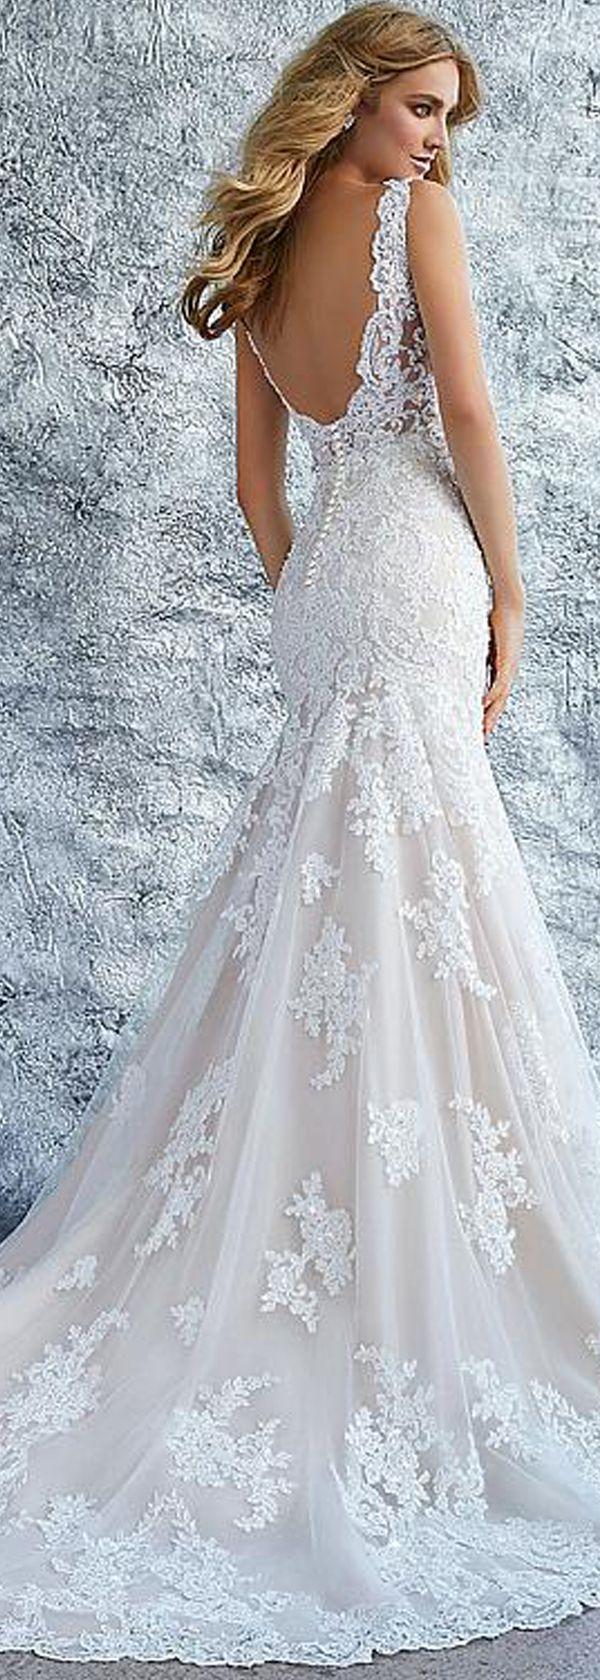 Mermaid Wedding Dresses Chic Tulle Amp Organza V Neck Neckline Mermaid Wedding Dress With Beaded